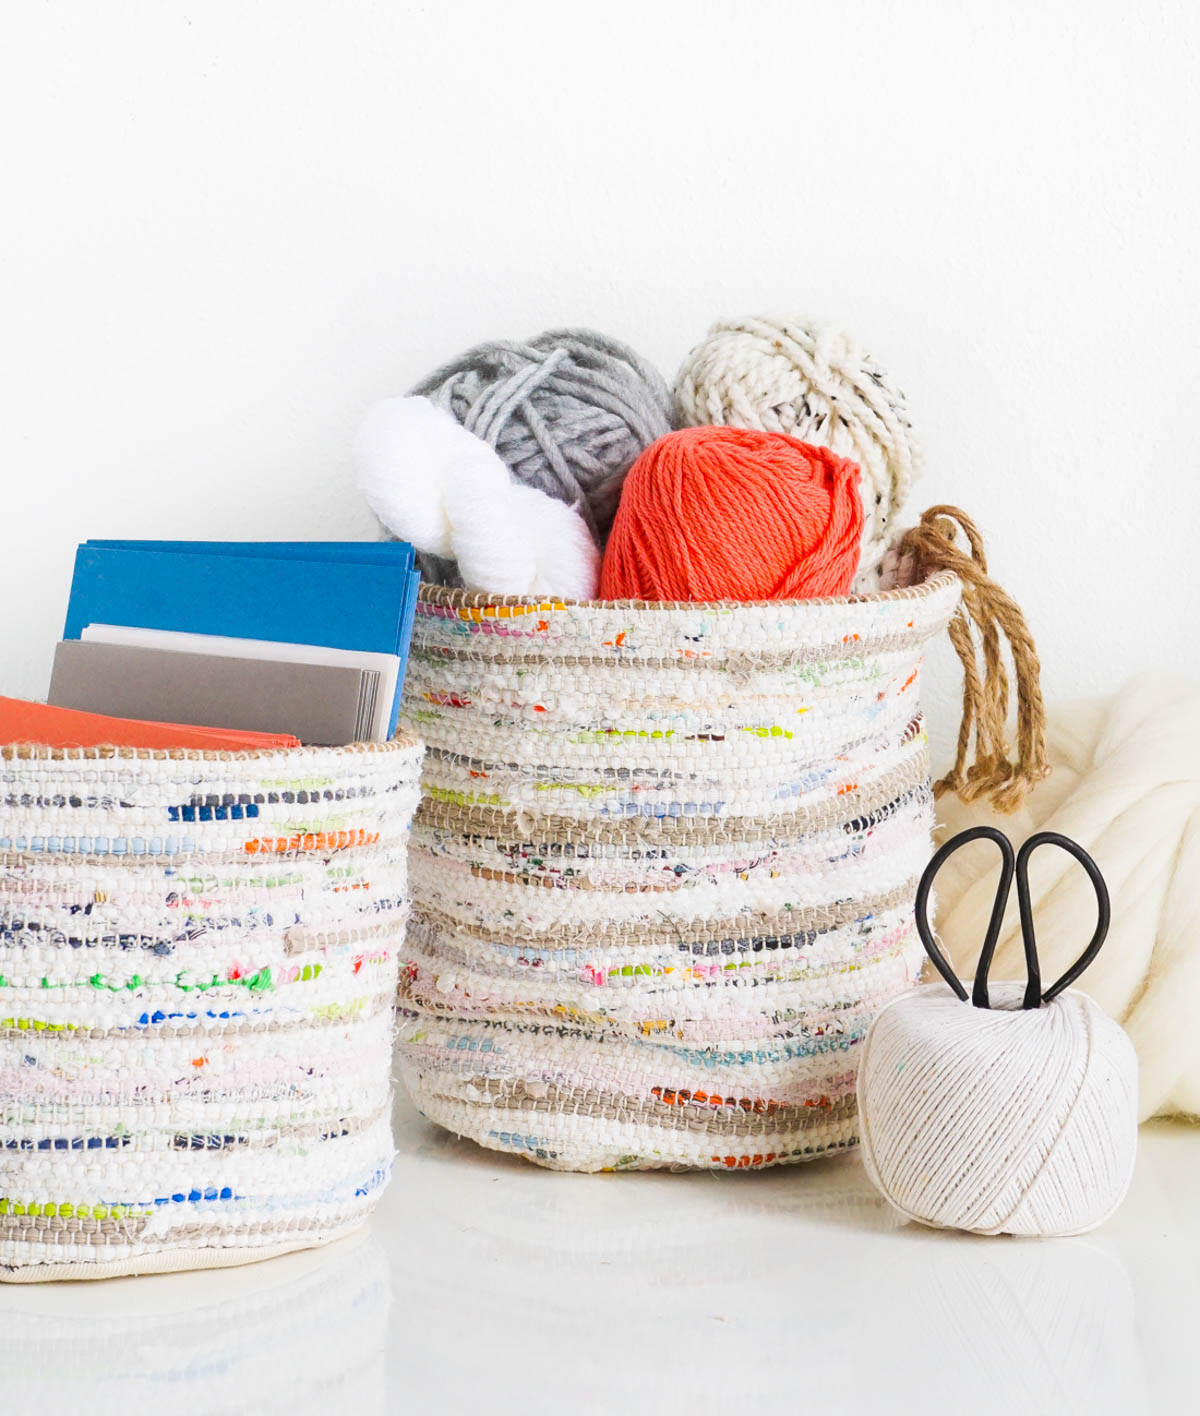 DIY Rag Rug Storage Baskets